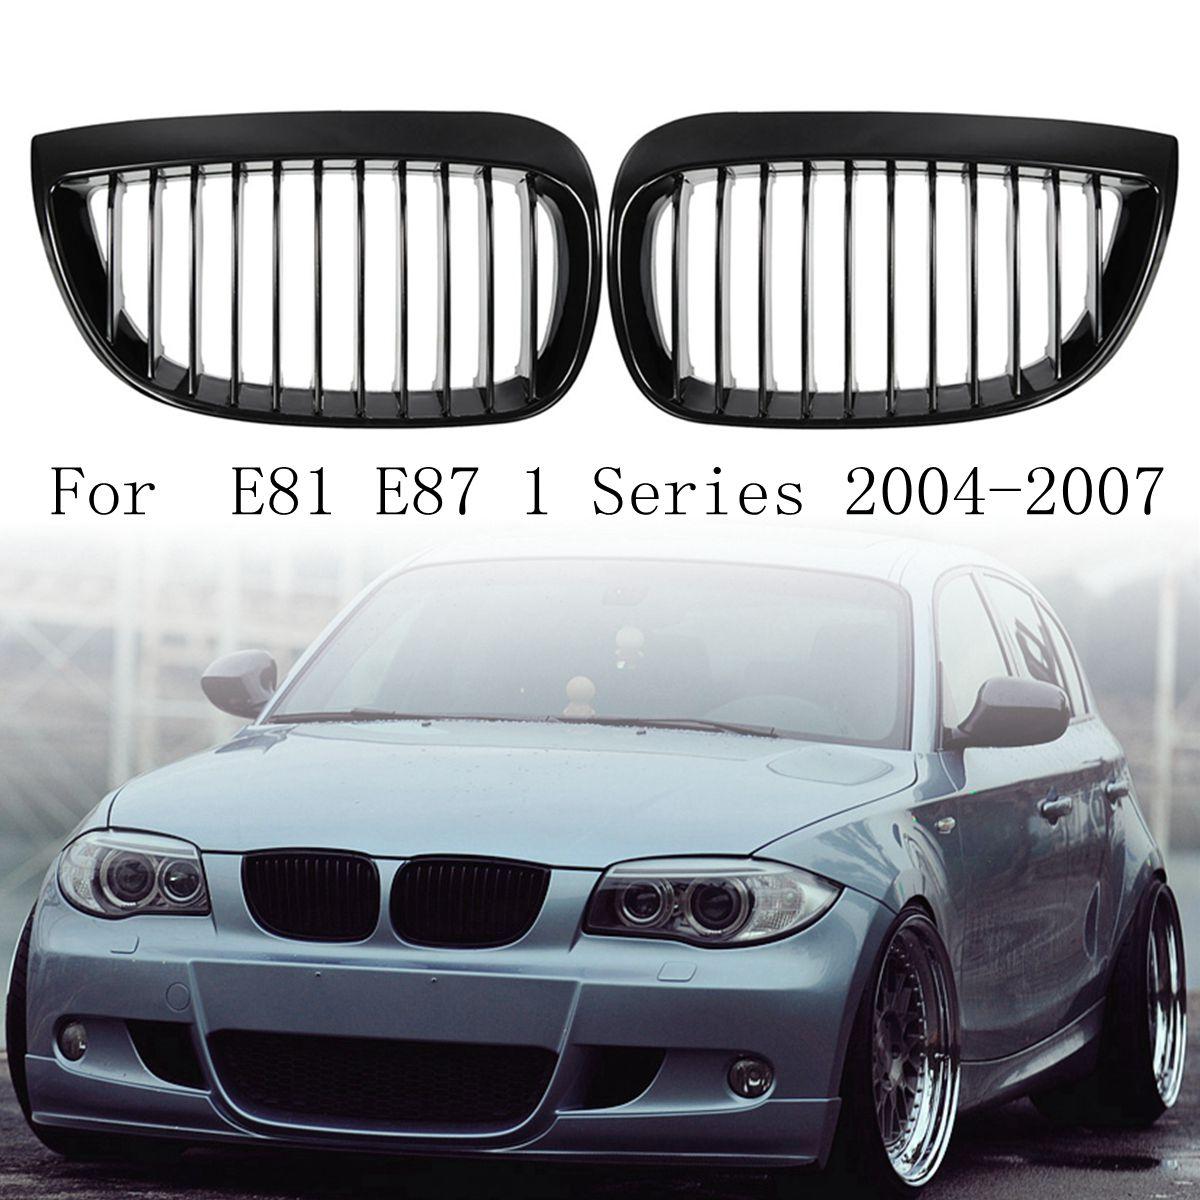 for BMW E87 E81 1 Series 2004 - 2007 Pair Left & Right Car Front Sport Kidney Grill Grilles Matt Blackfor BMW E87 E81 1 Series 2004 - 2007 Pair Left & Right Car Front Sport Kidney Grill Grilles Matt Black